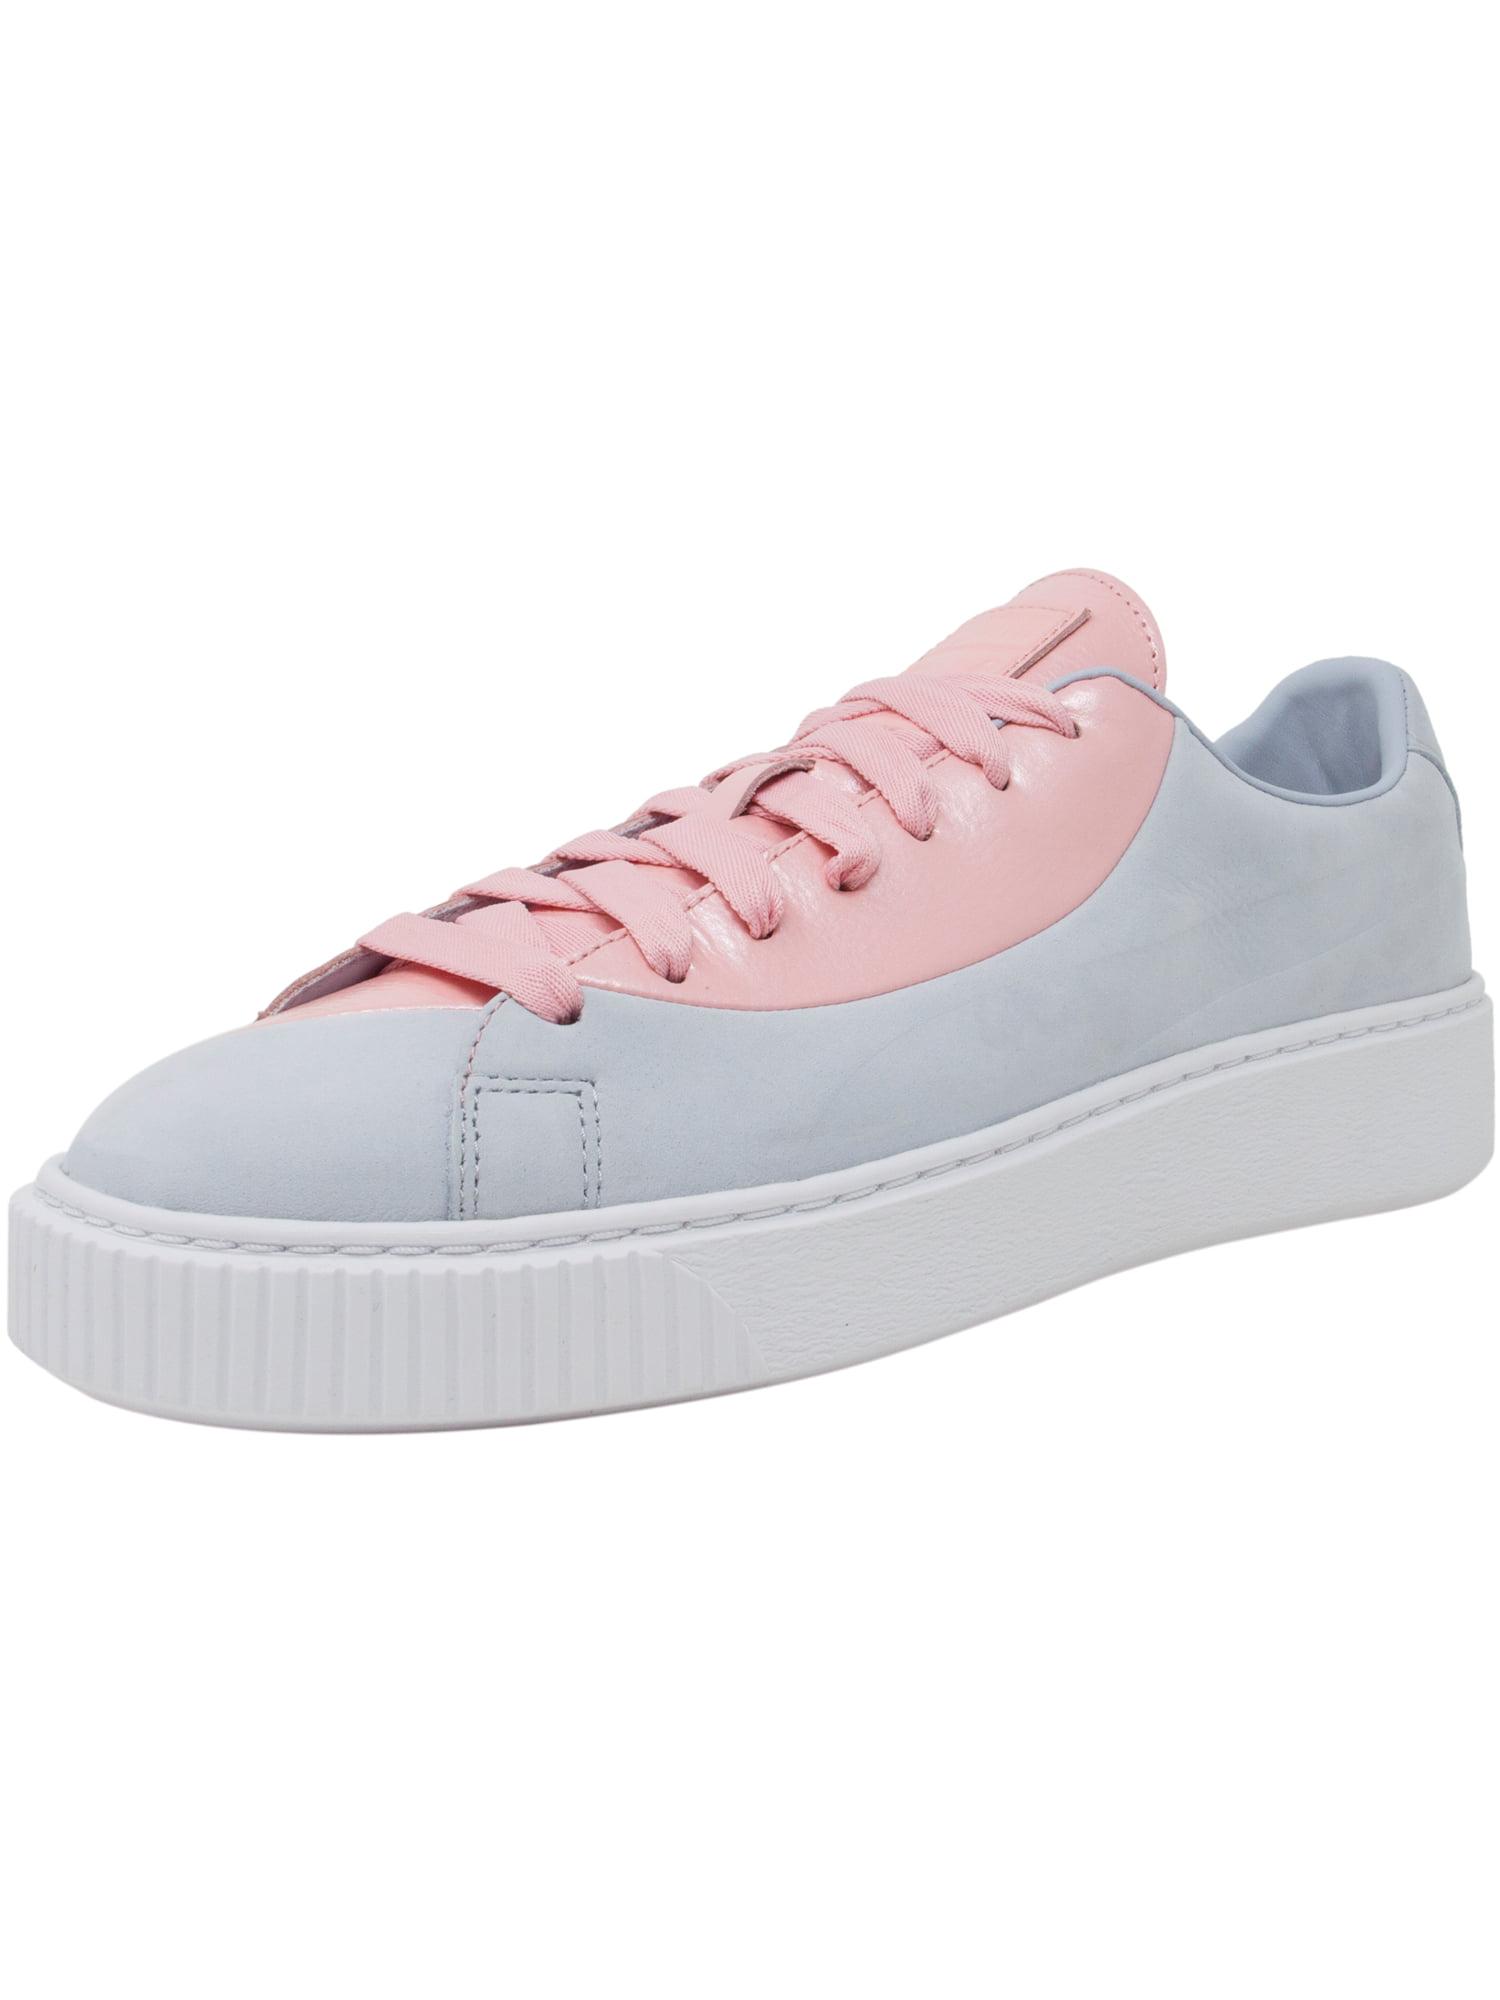 Puma Women's Basket Platform Val Fm Grey Dawn Ankle-High Leather Fashion Sneaker - 11M